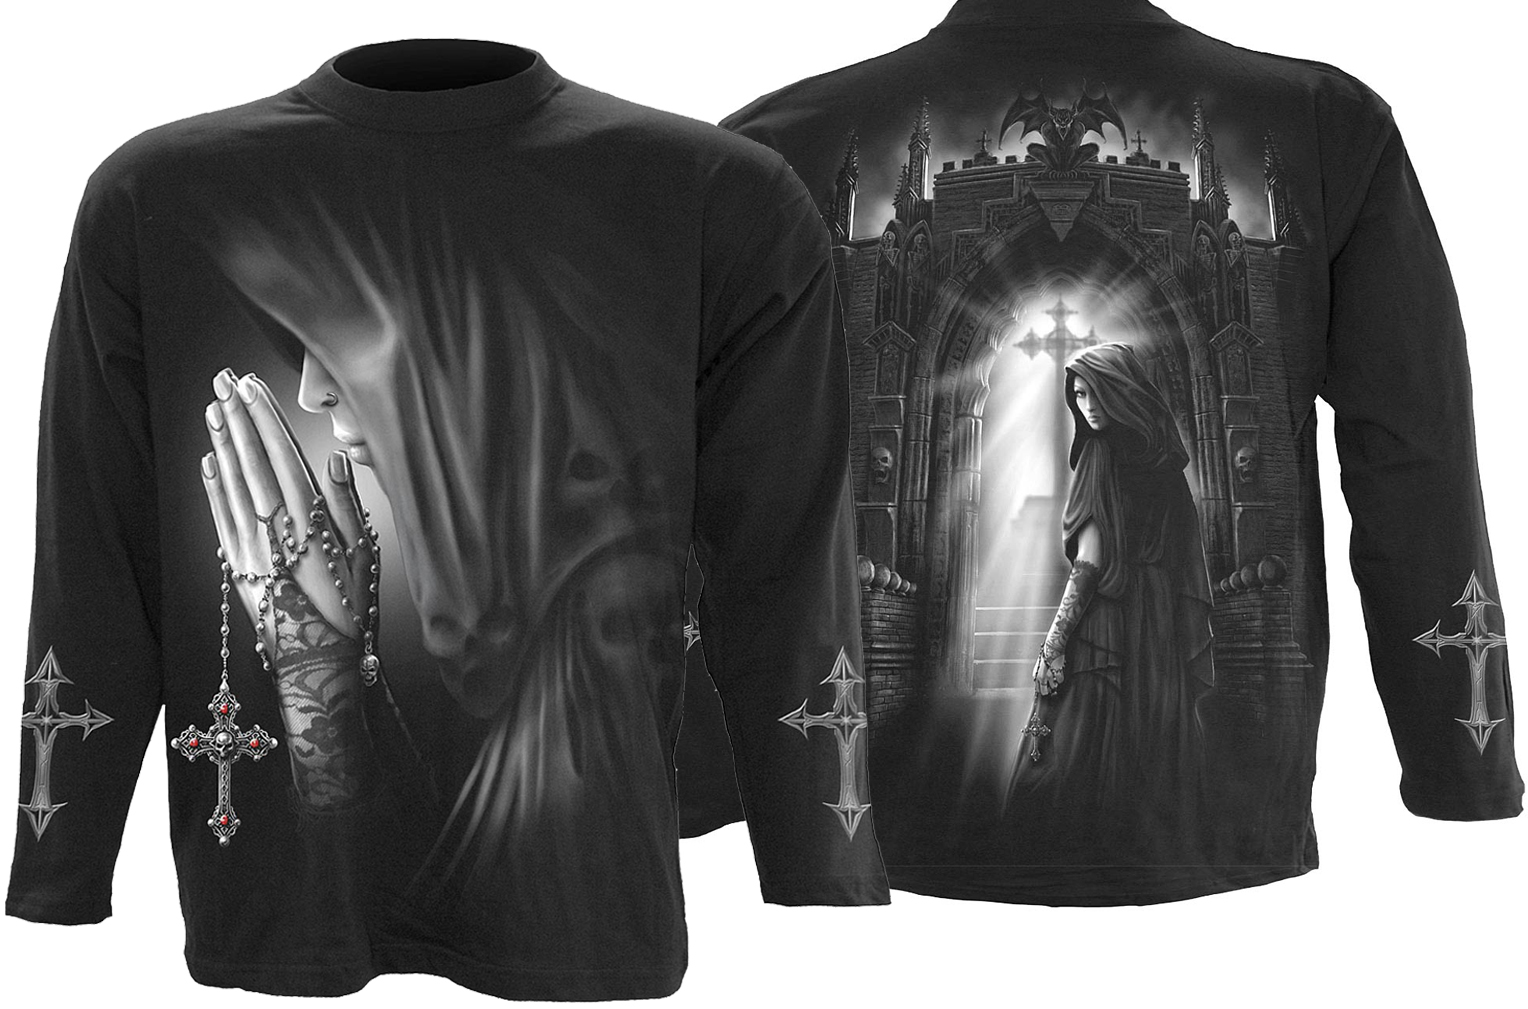 SPIRAL Exorcism Longsleeve T-Shirt Black D022M301